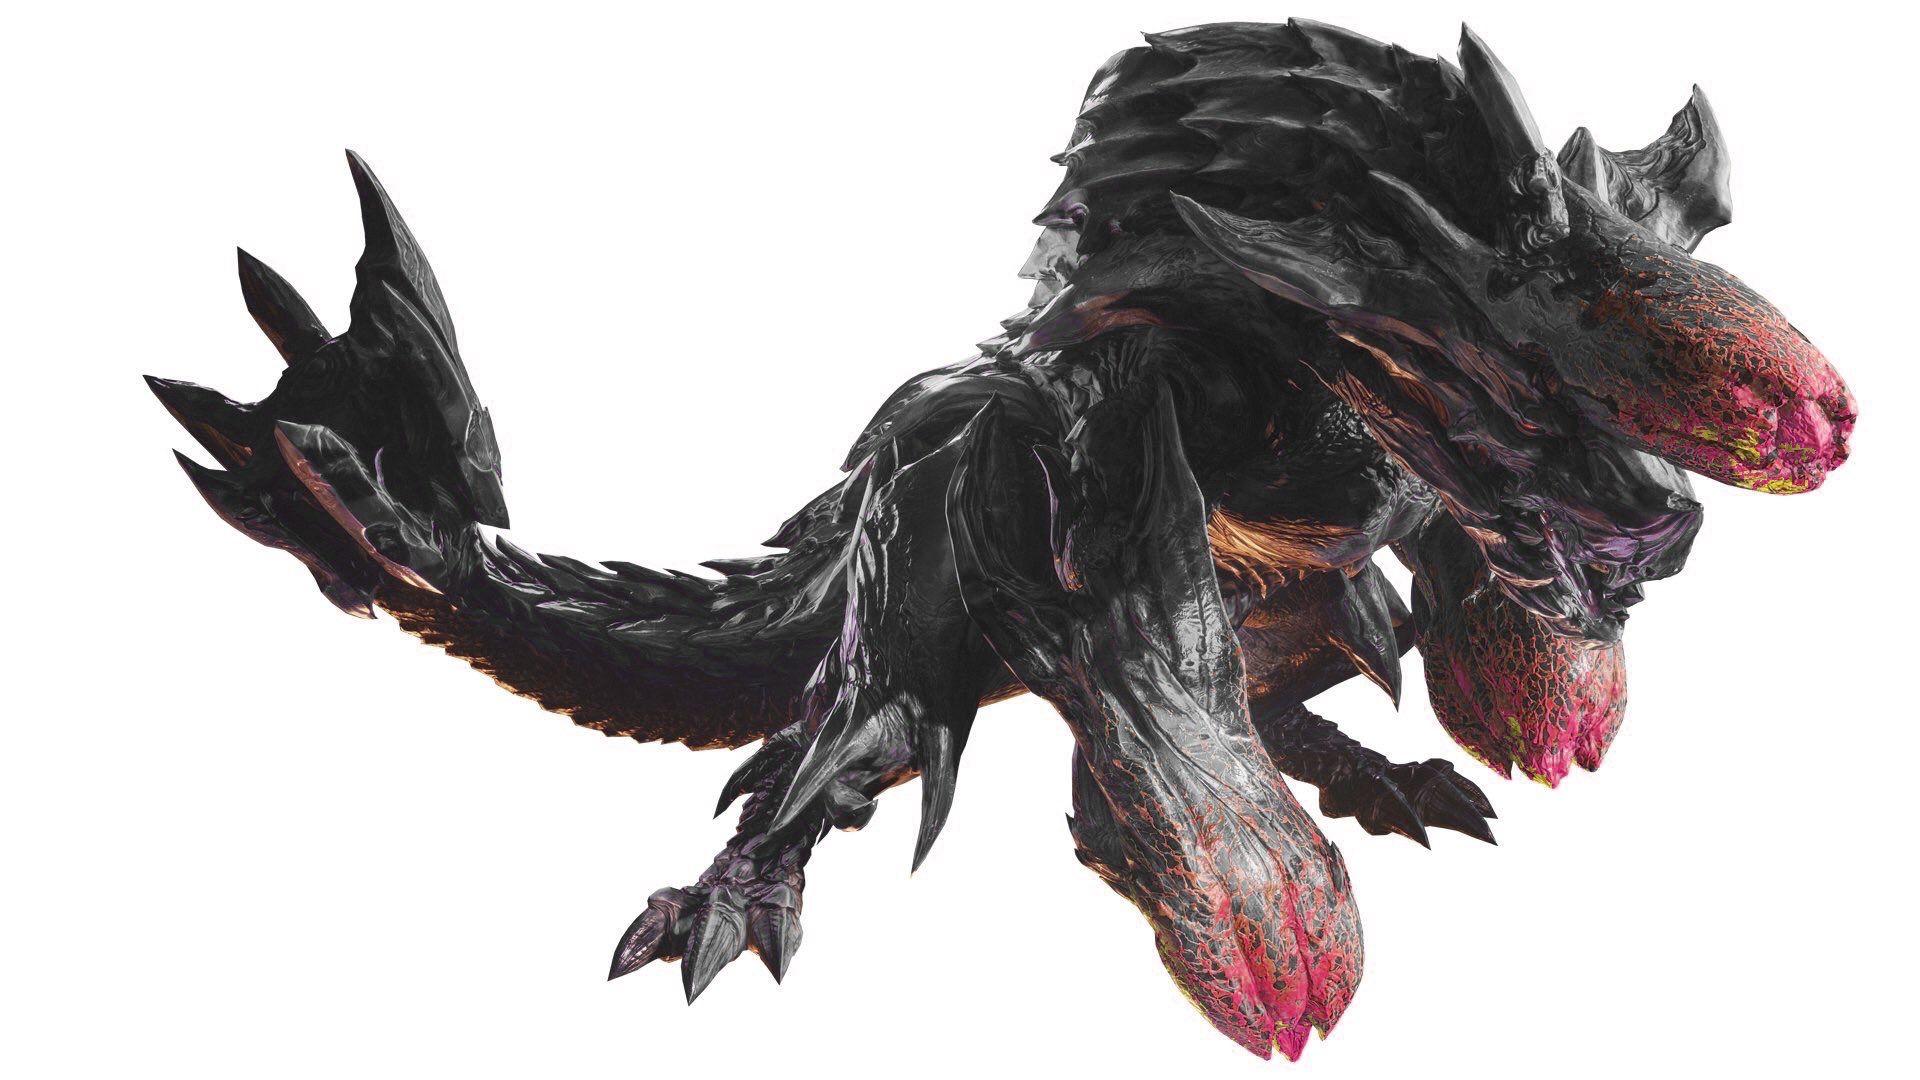 Monsterhunter World モンスターハンターワールド Monster Hunter Monster Hunter Art Monster Hunter Wiki